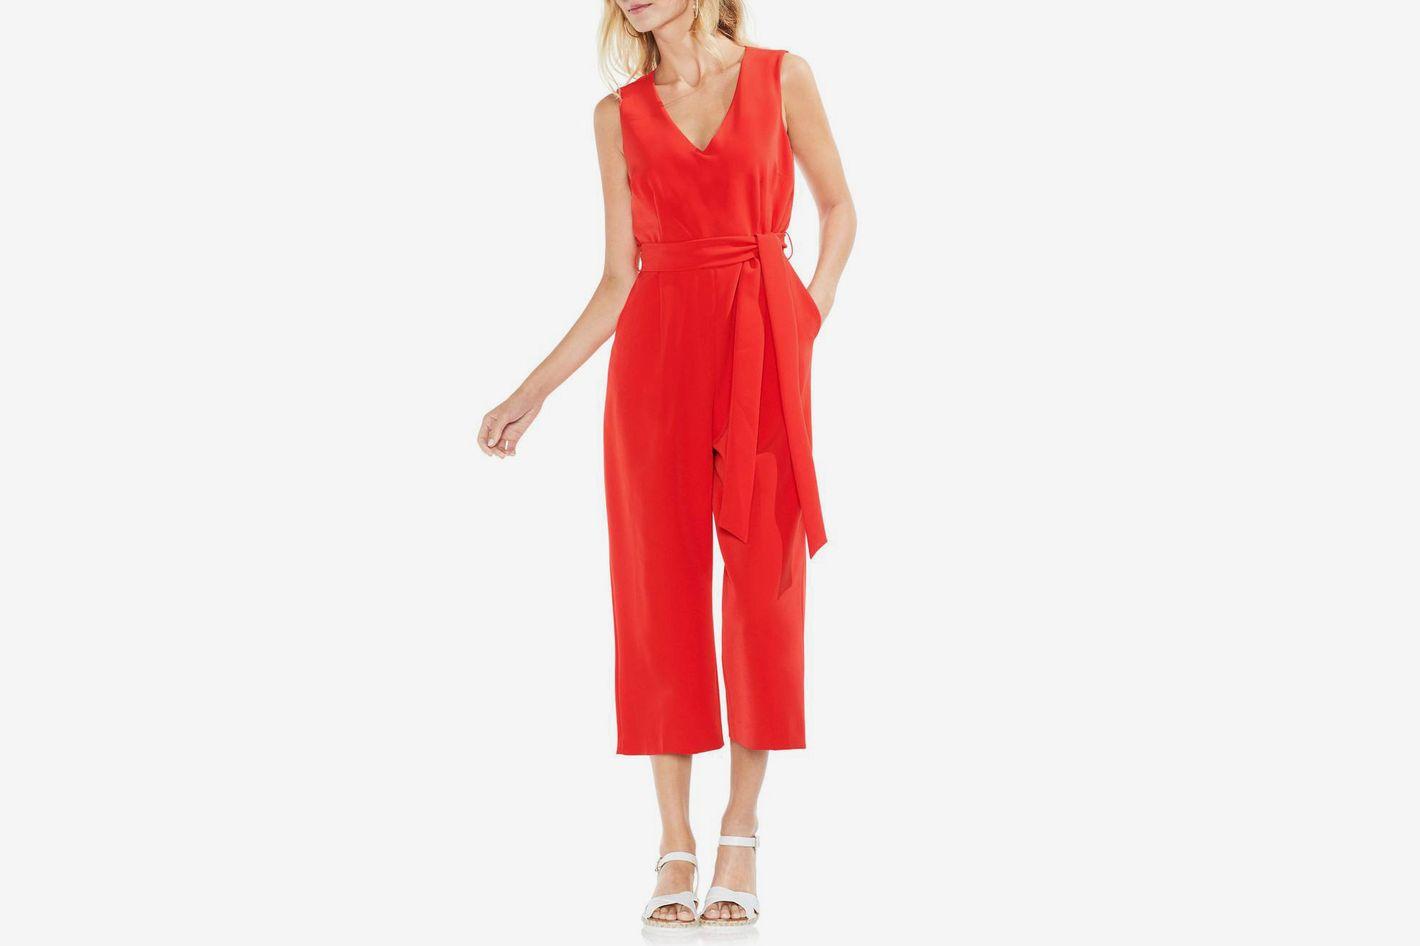 b16f485a796 VINCE CAMUTO Sleeveless Tie Waist Jumpsuit